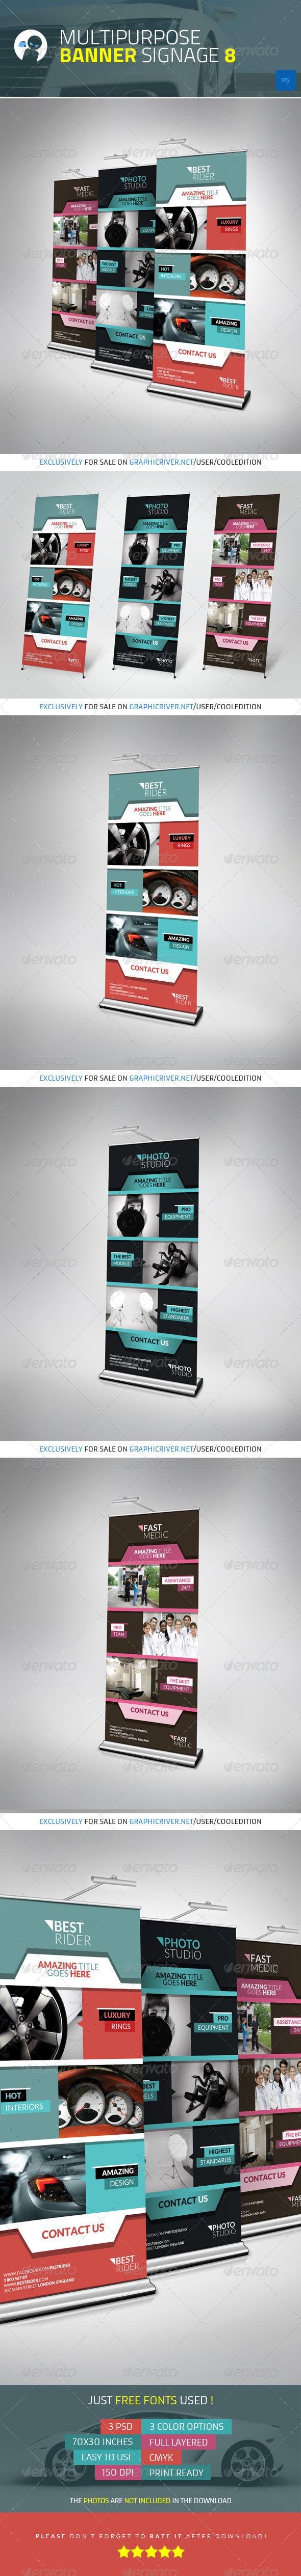 Multipurpose Banner Signage 8 - Signage Print Templates